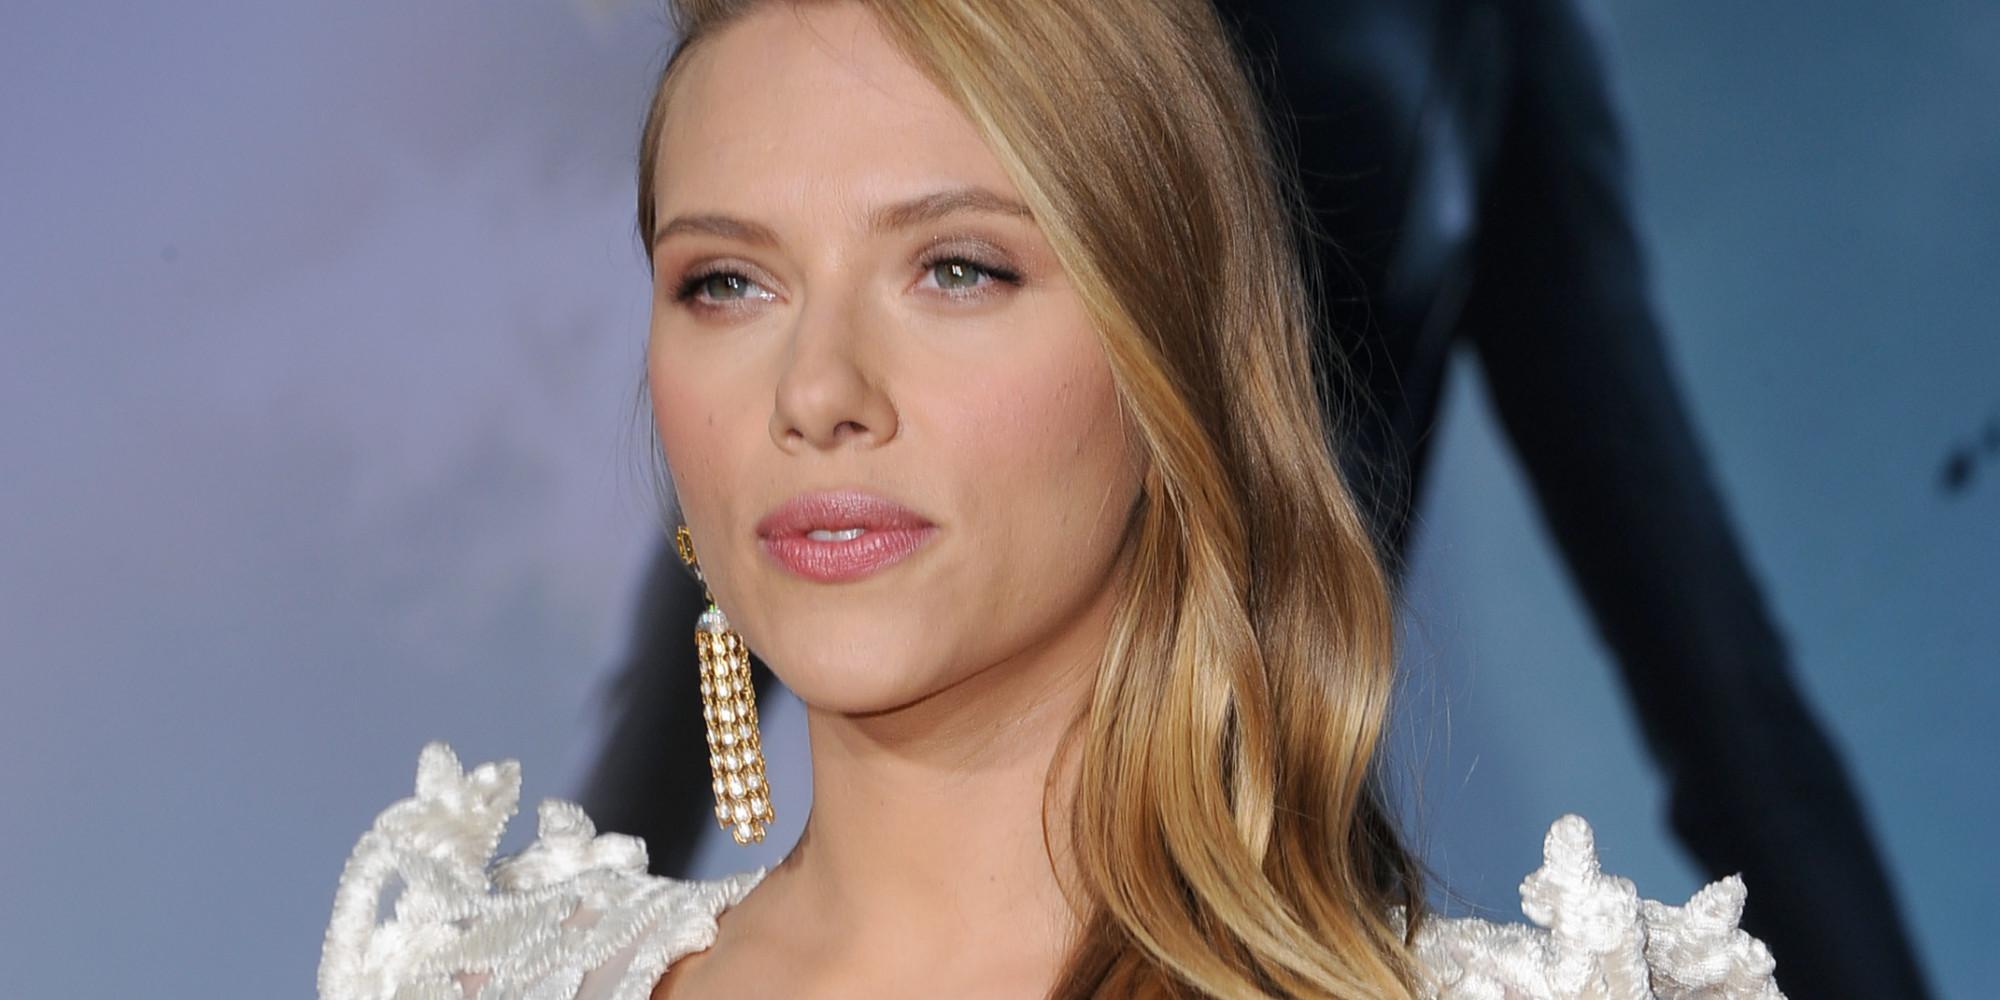 Scarlett johansson 2014 all full hot scenes latest - 1 part 8